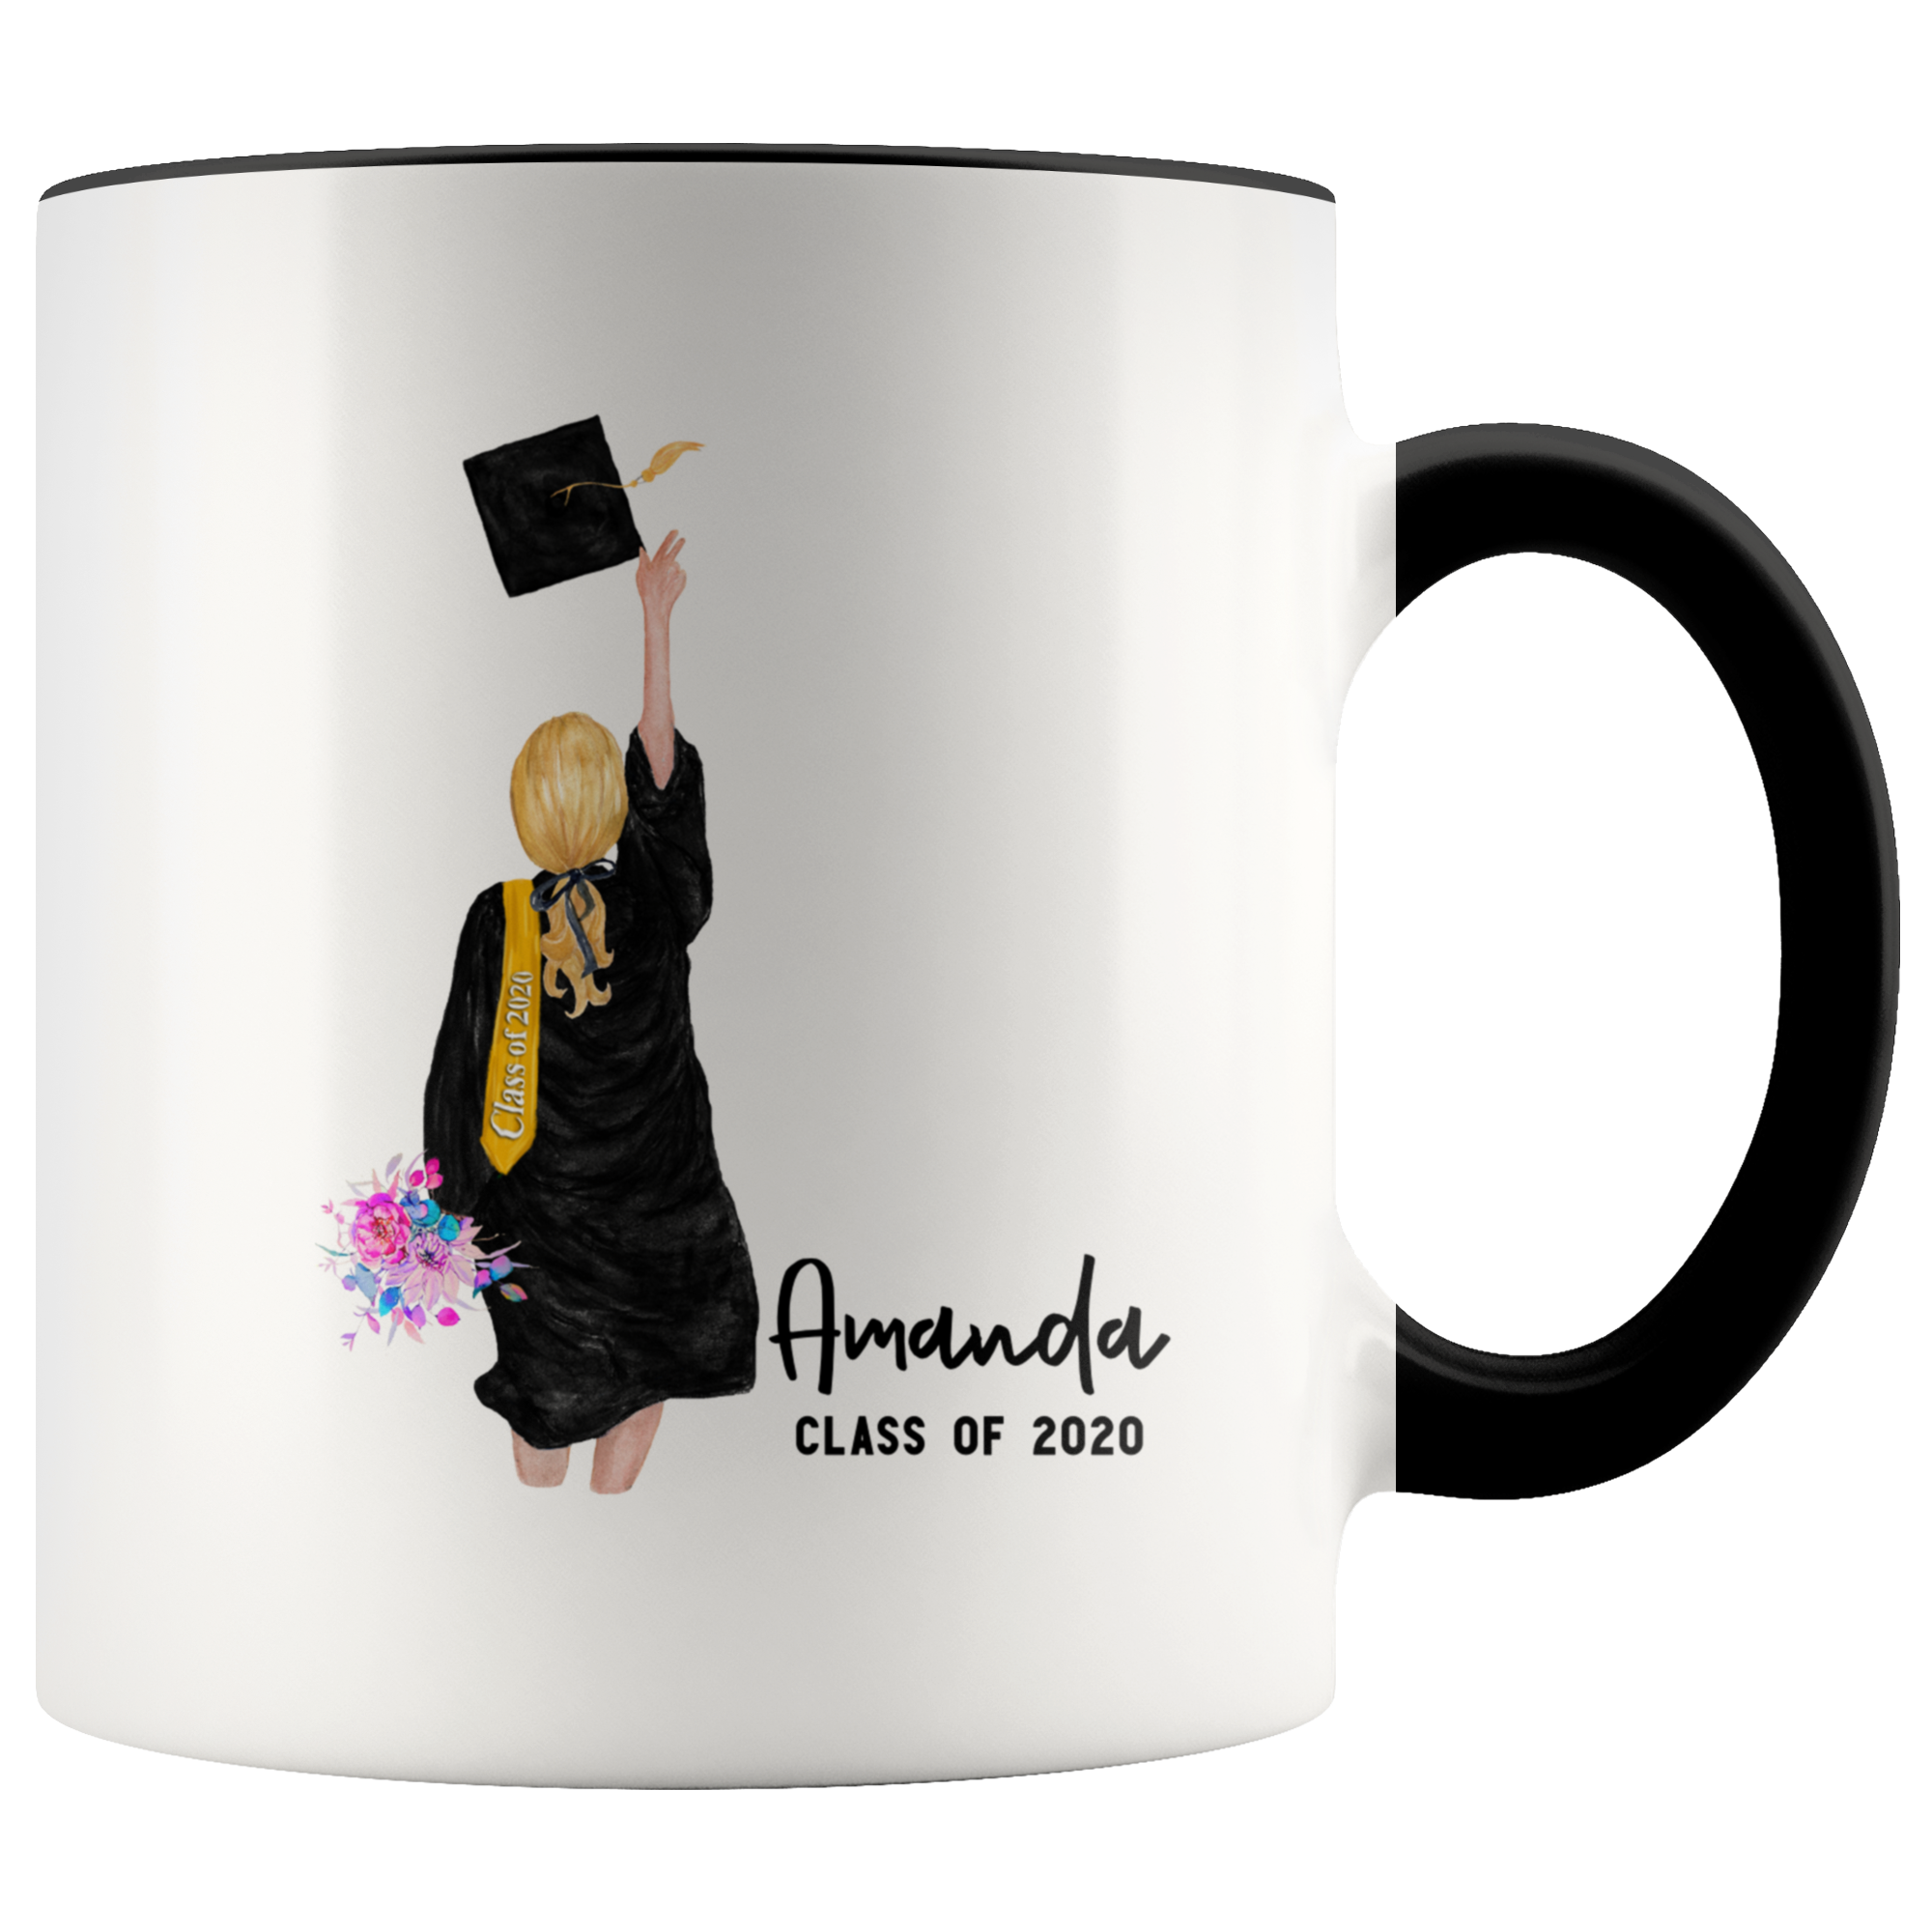 Pin on Graduation Gifts